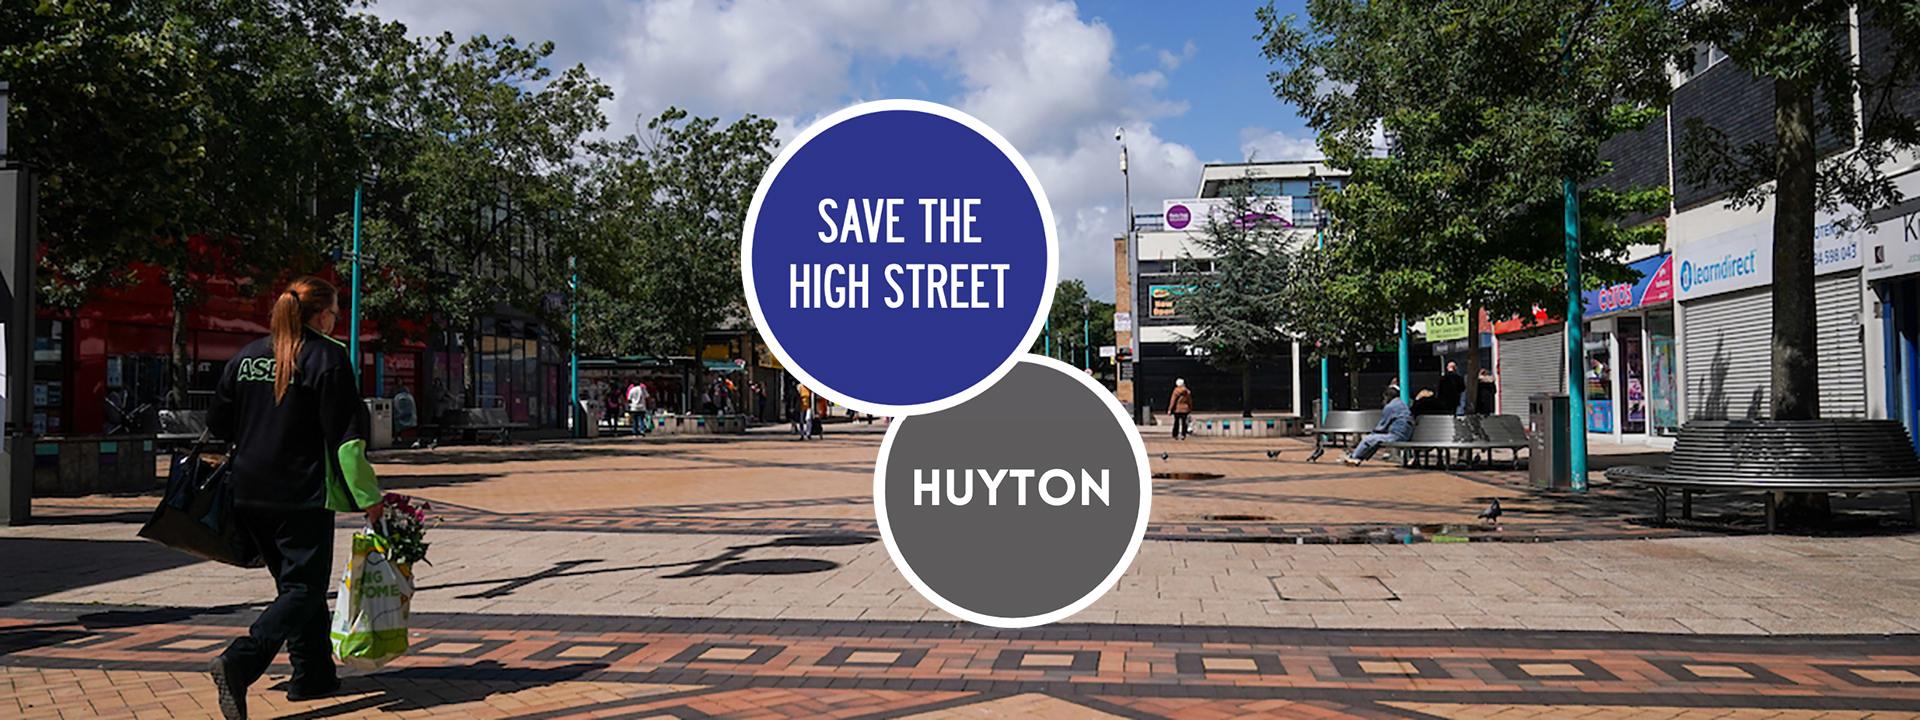 Monday 6 July 2020. Prescot and Huyton